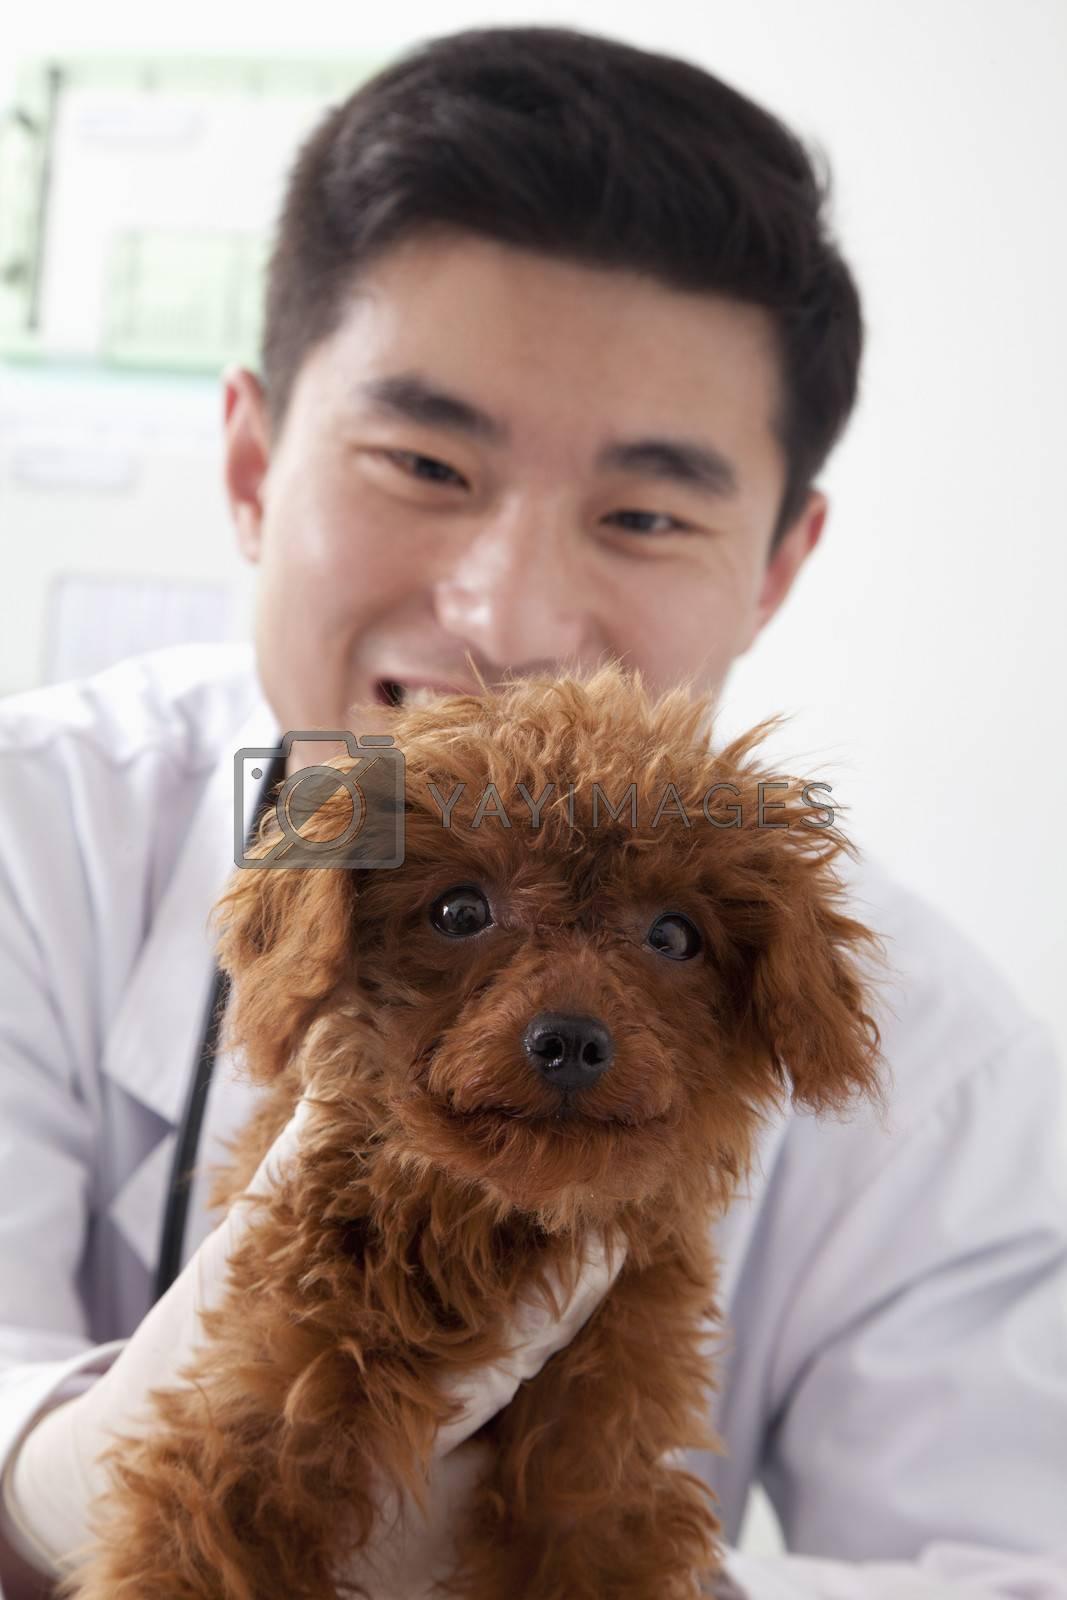 Veterinarian holding dog in office